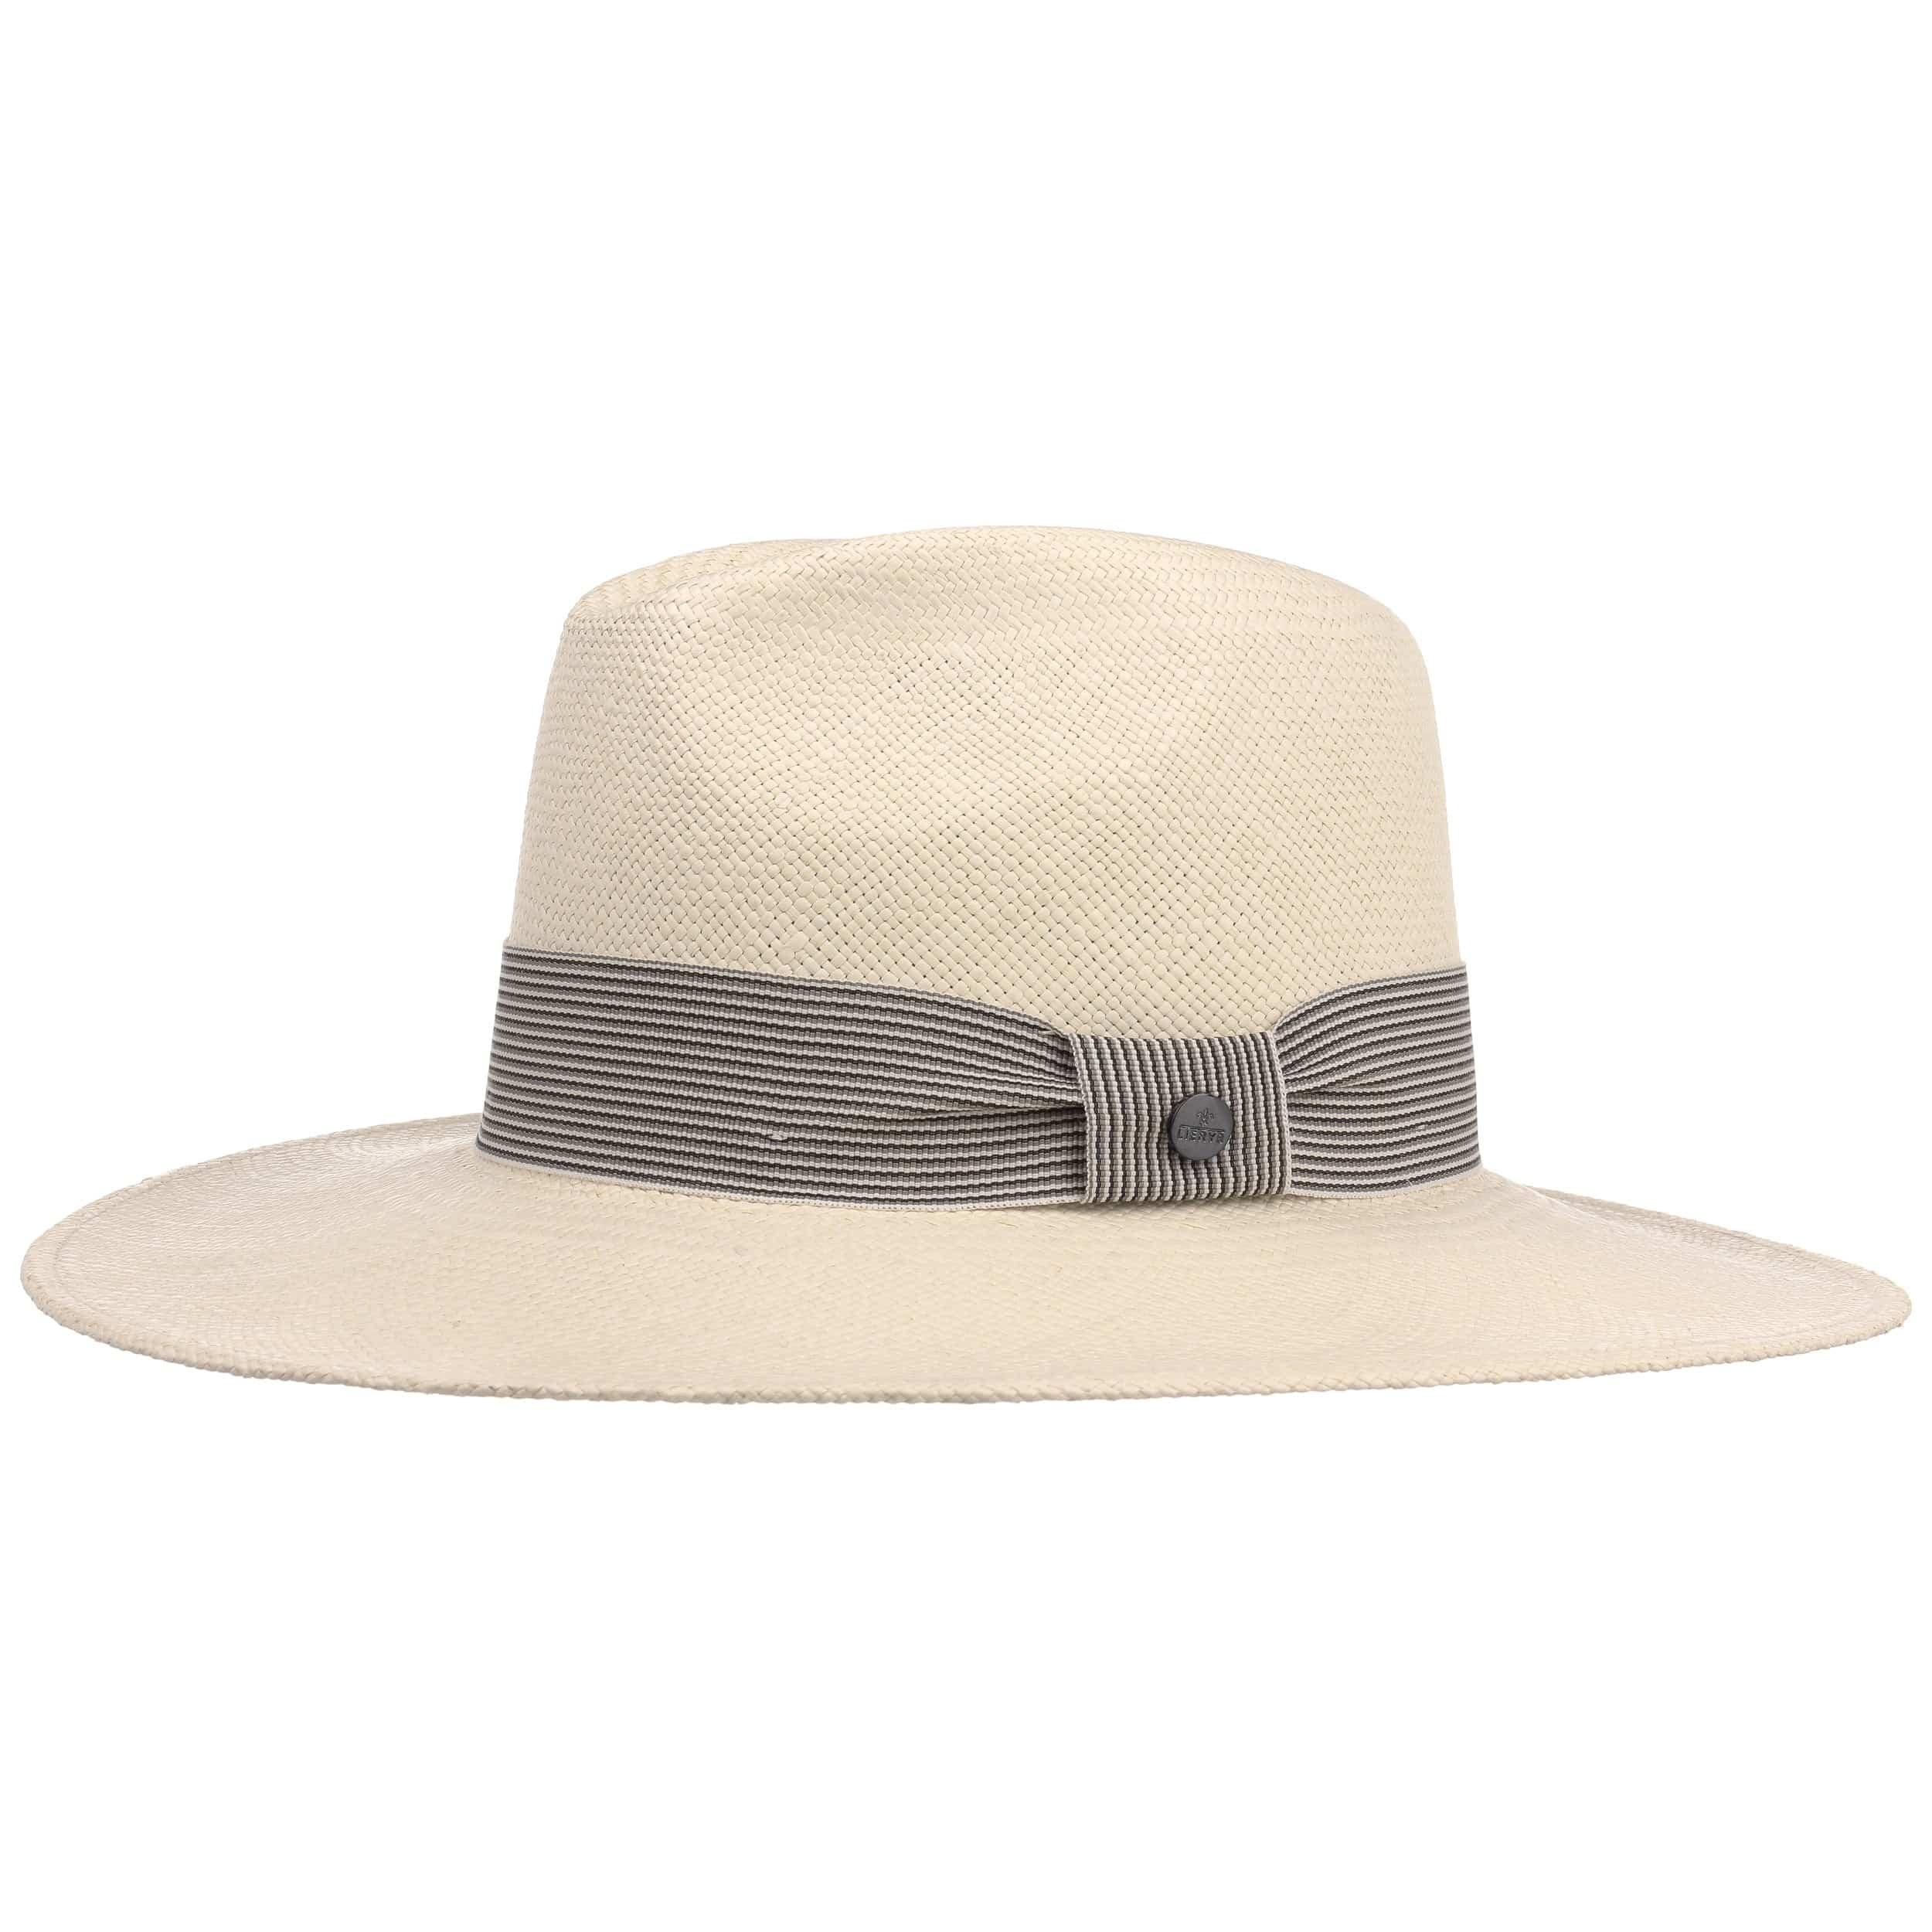 Coloured Trim Panama Hat by Lierys Sun hats Lierys amdPtefE2